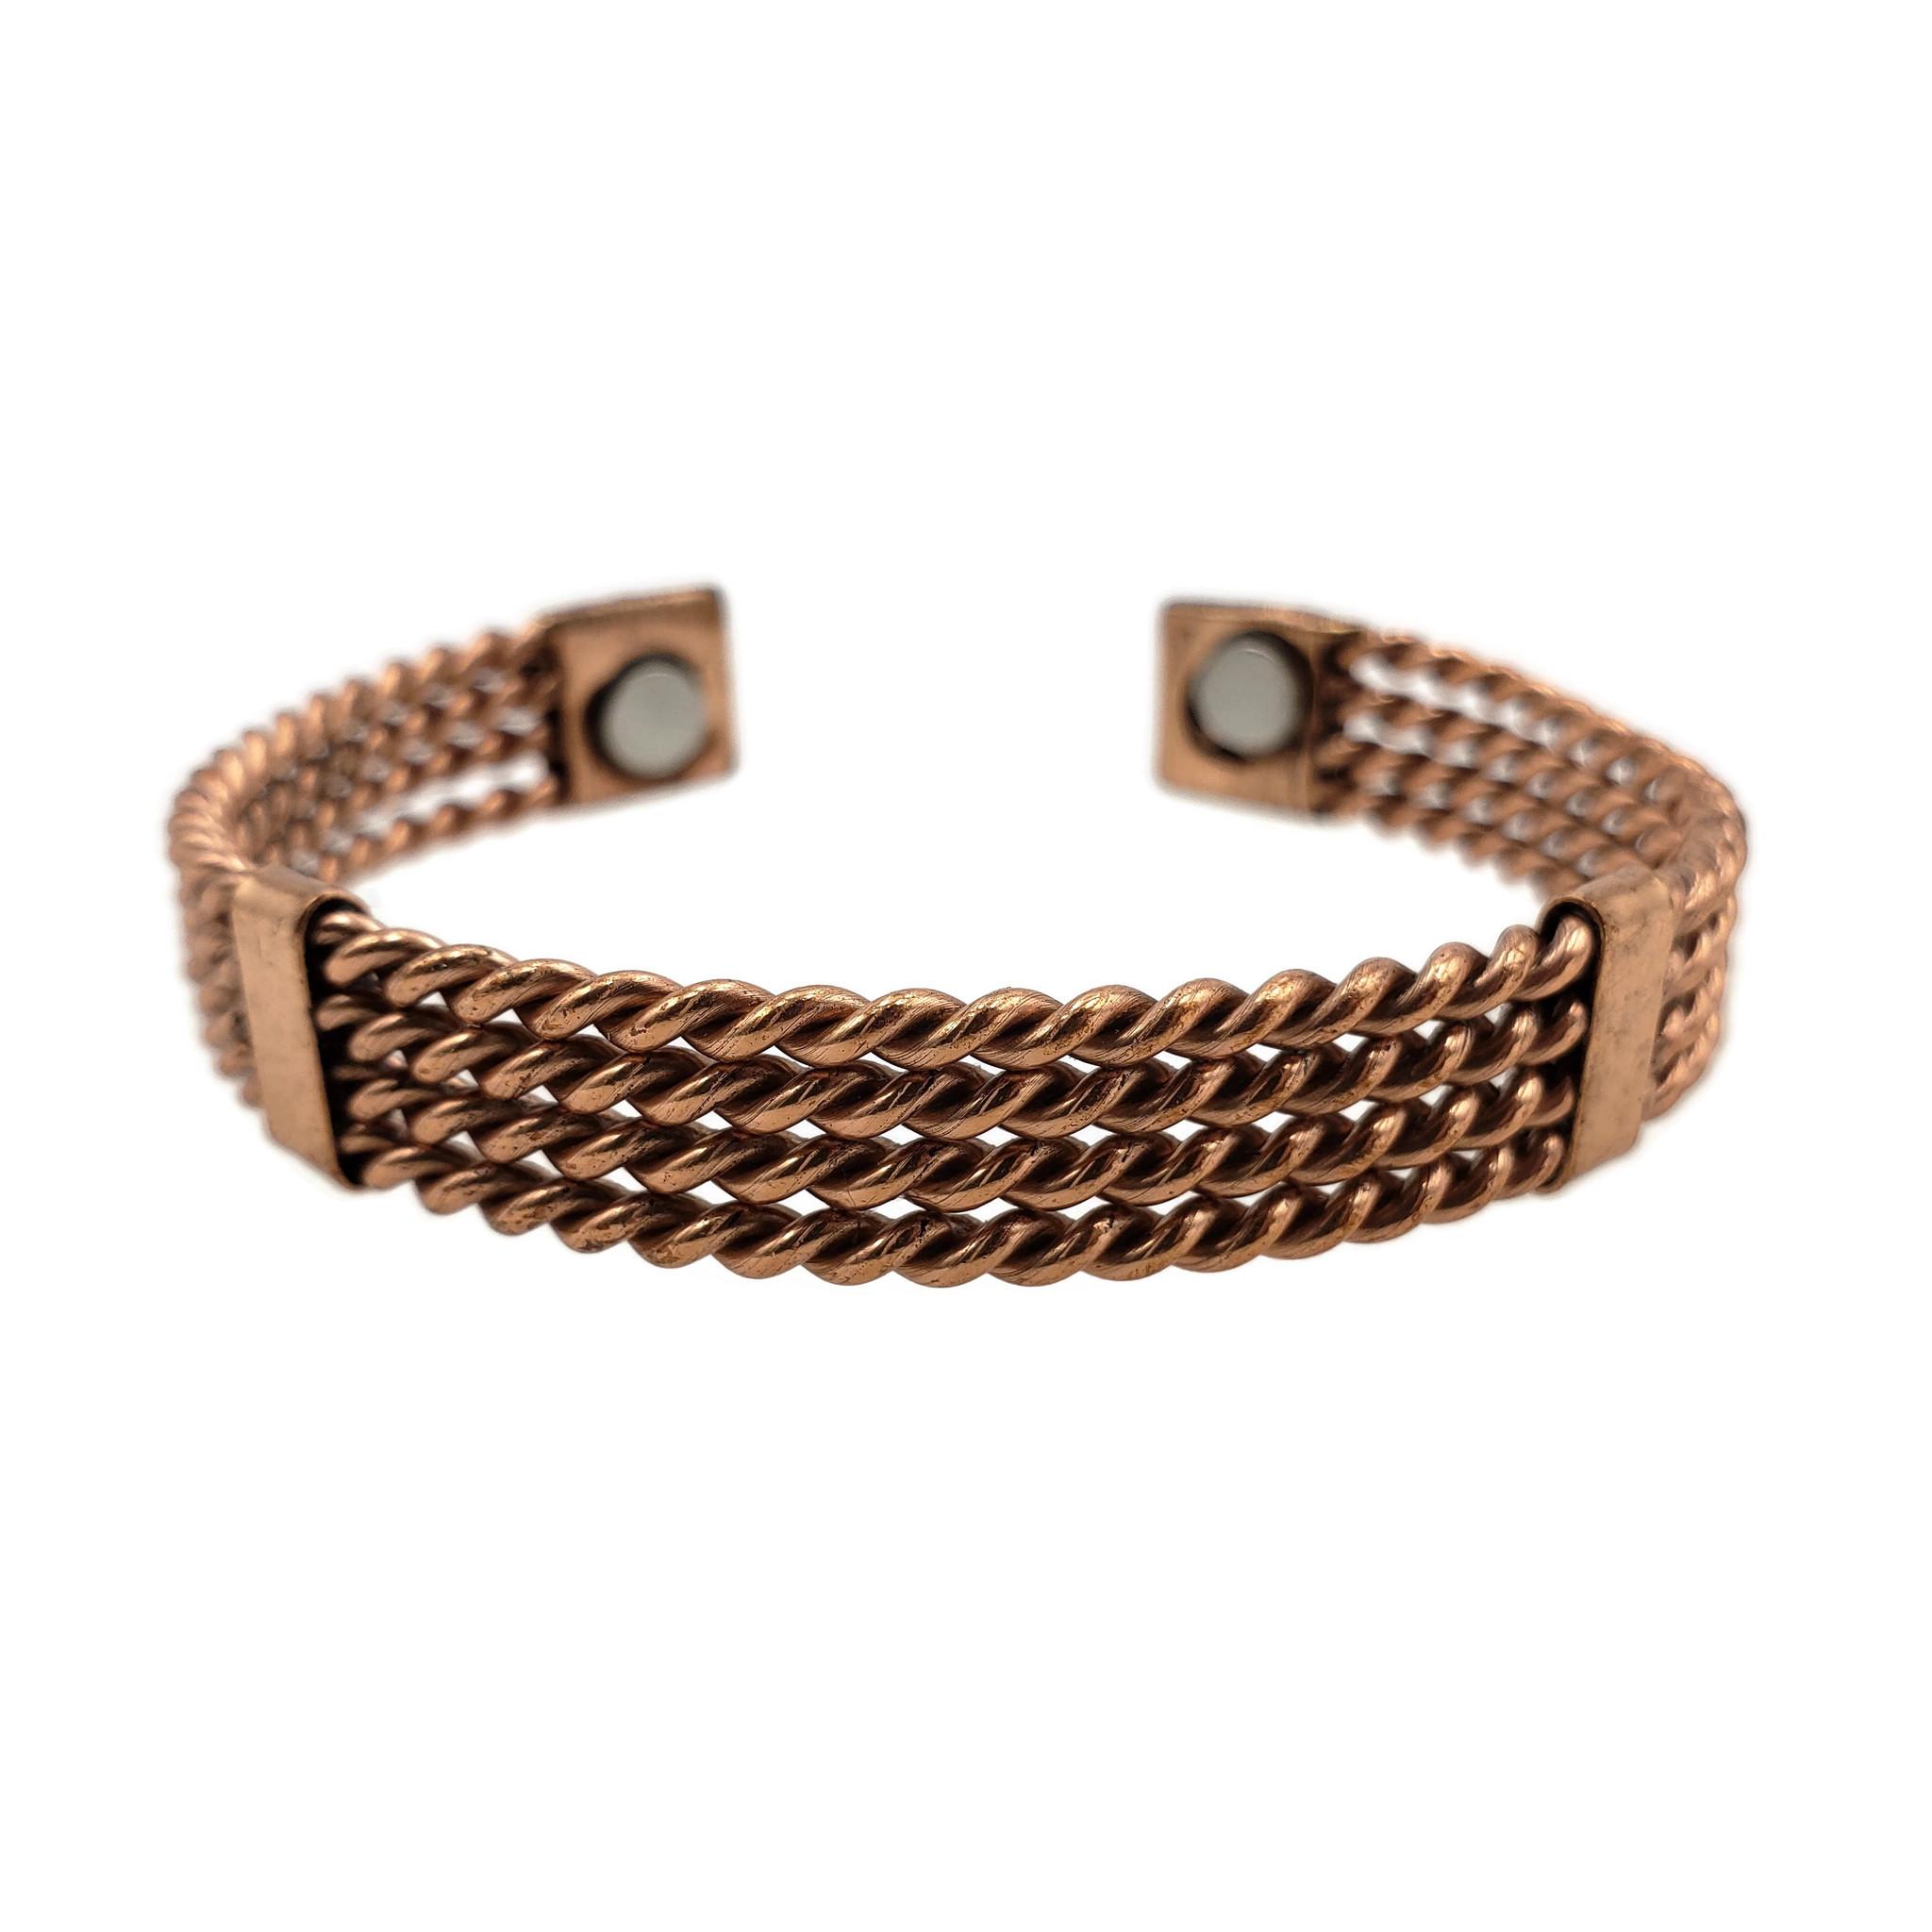 Ameena 4 Layer Twisted Copper Cuff